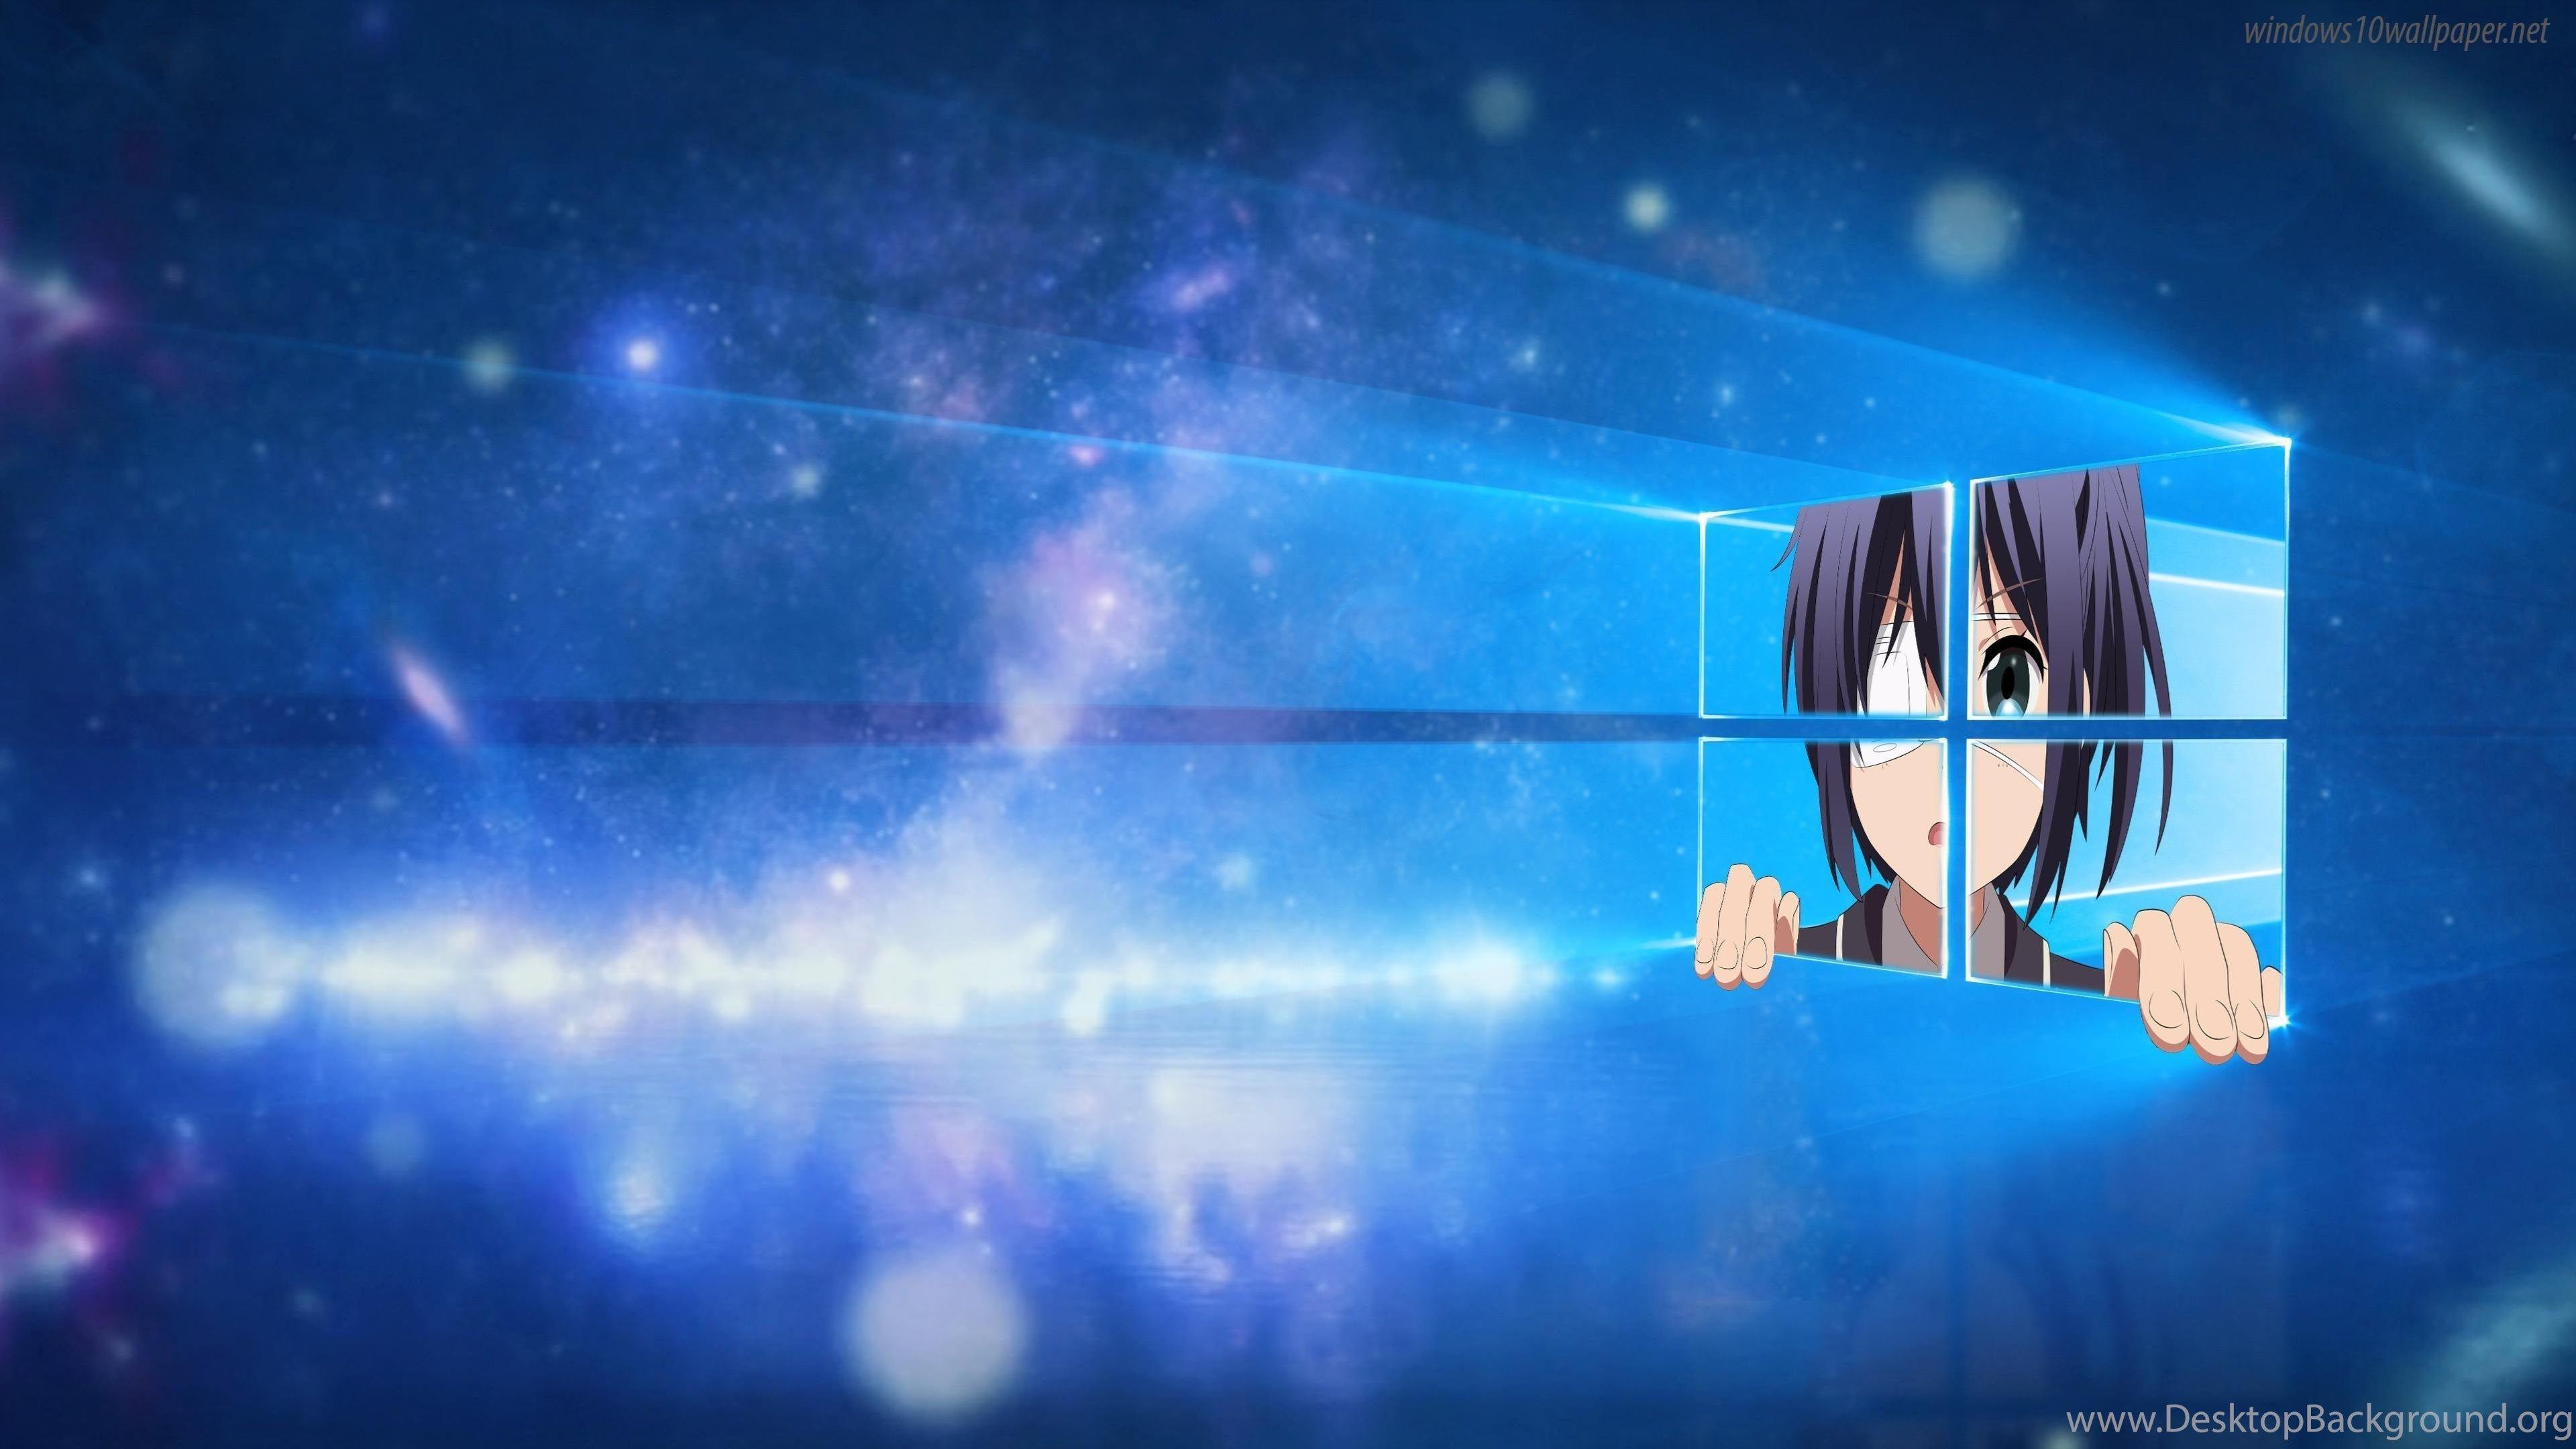 Desktop 4k Anime Wallpapers Wallpaper Cave